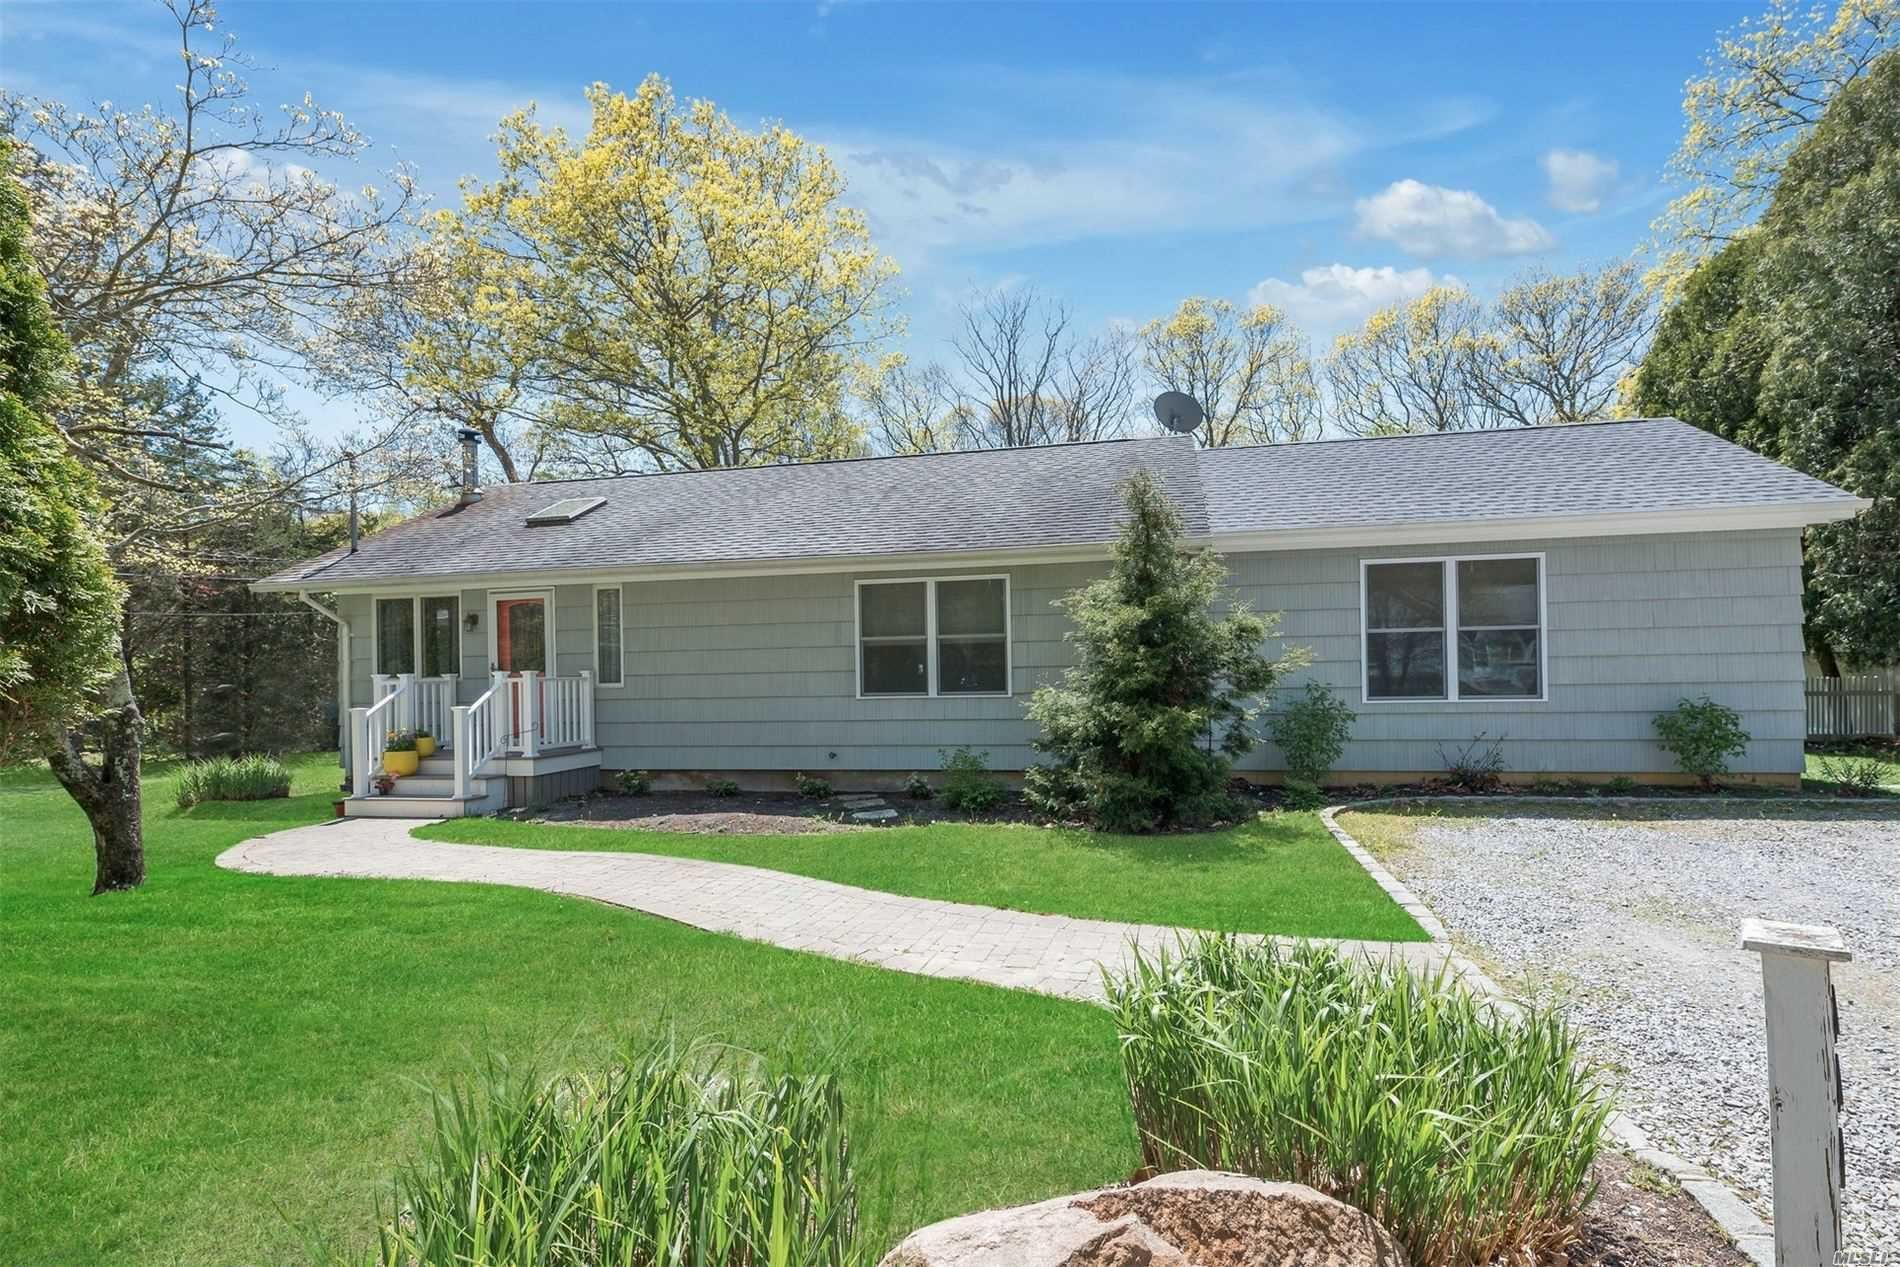 440 Cedar Drive, Mattituck, NY 11952 - MLS#: 3215008